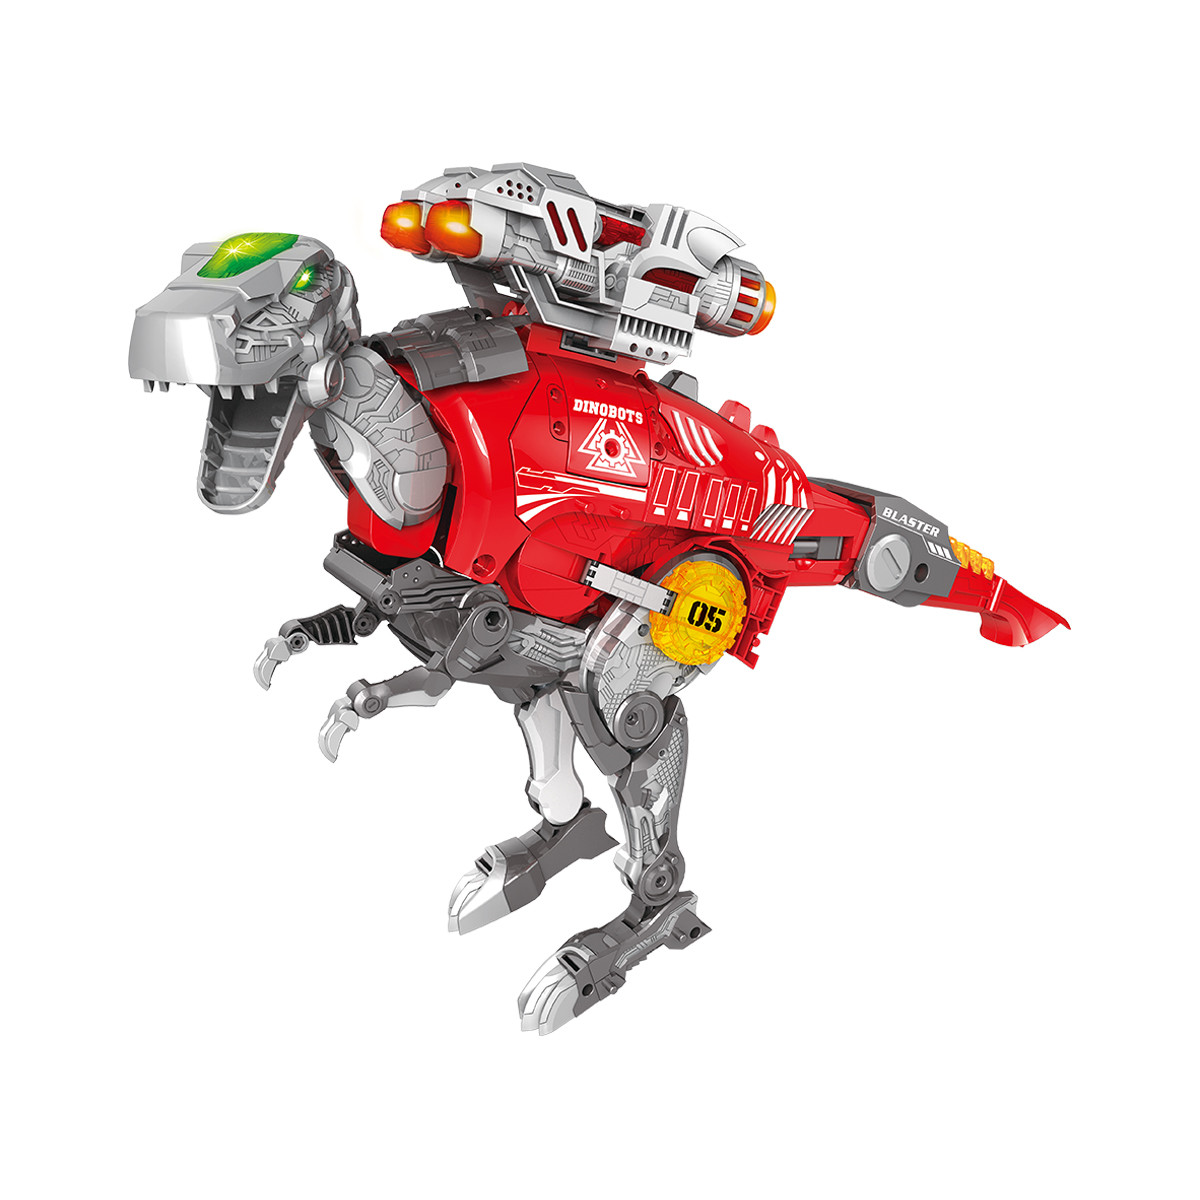 Dinobots Динобот-Трансформер - Тираннозавр Dinobots Robot Blaster Tyrannosaurus Rex SB379